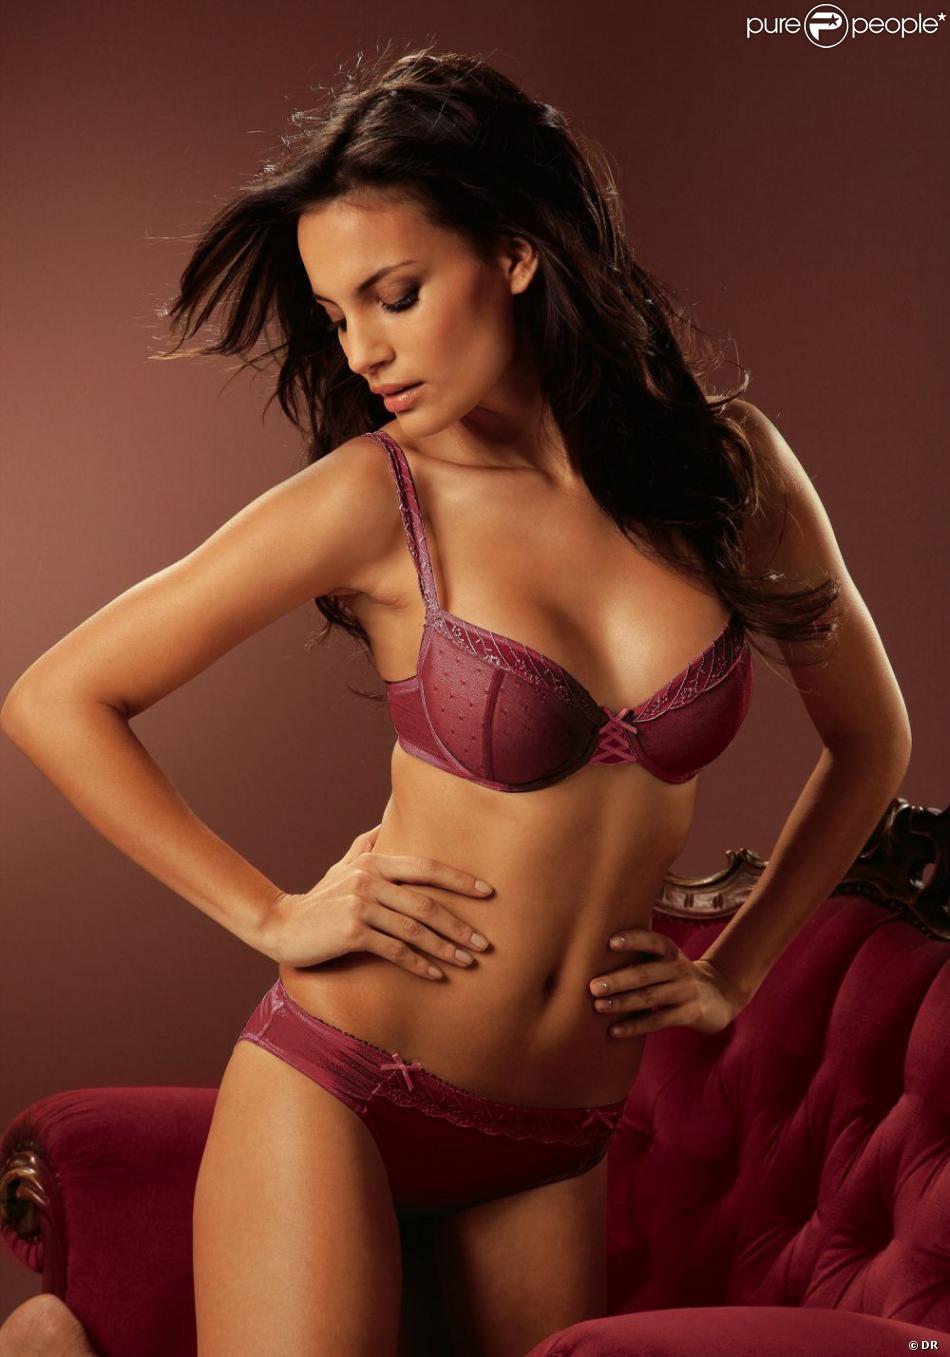 Santana Shalana Otto La Purepeople Sexy Pour Lingerie Nnv0w8m